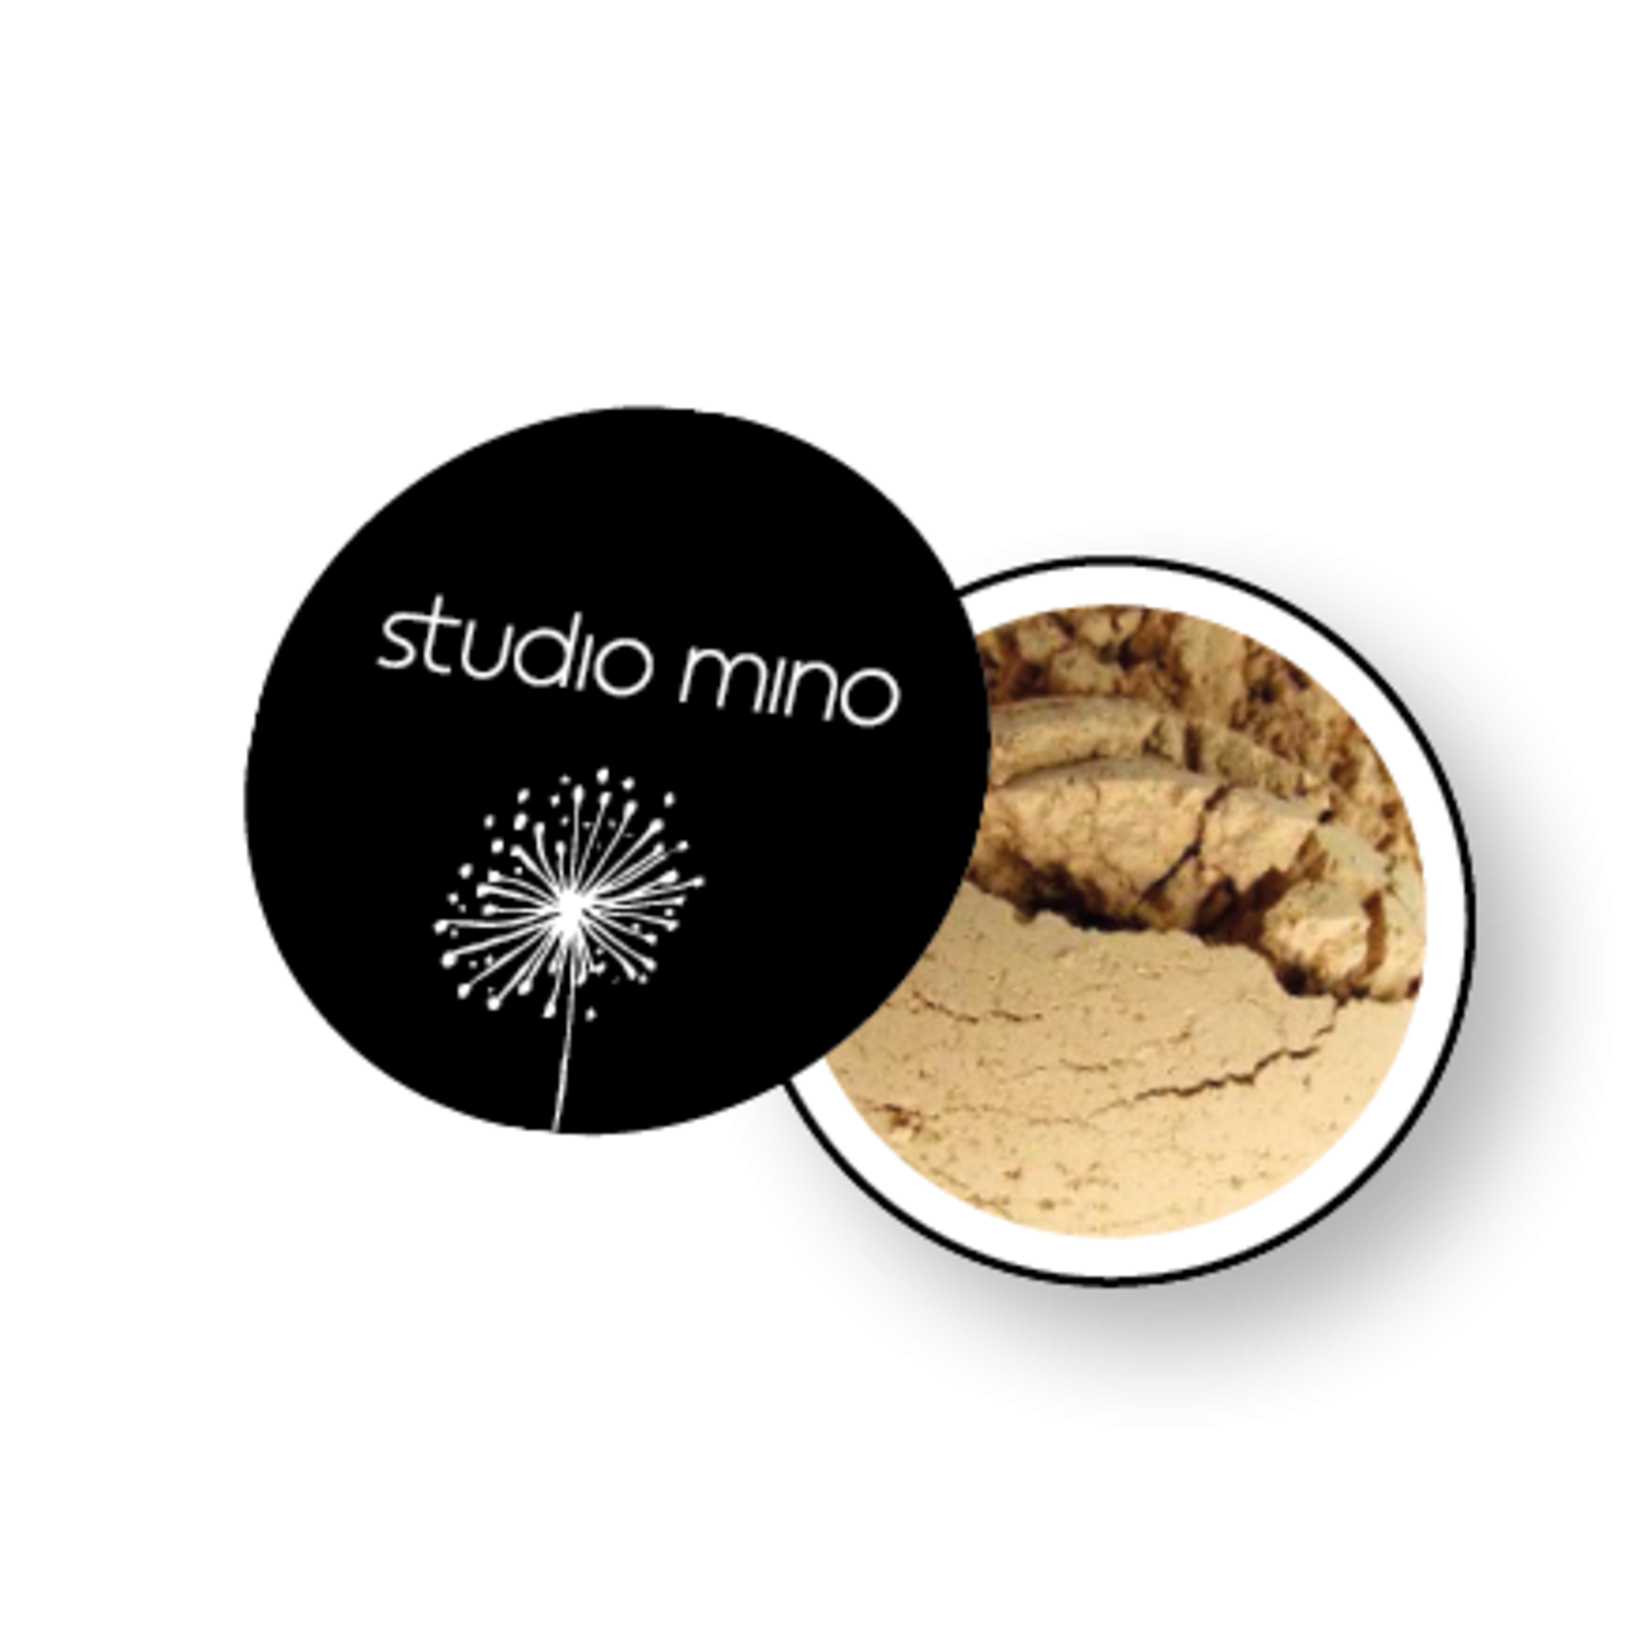 Studio mino Mineraal Primer poeder transparant